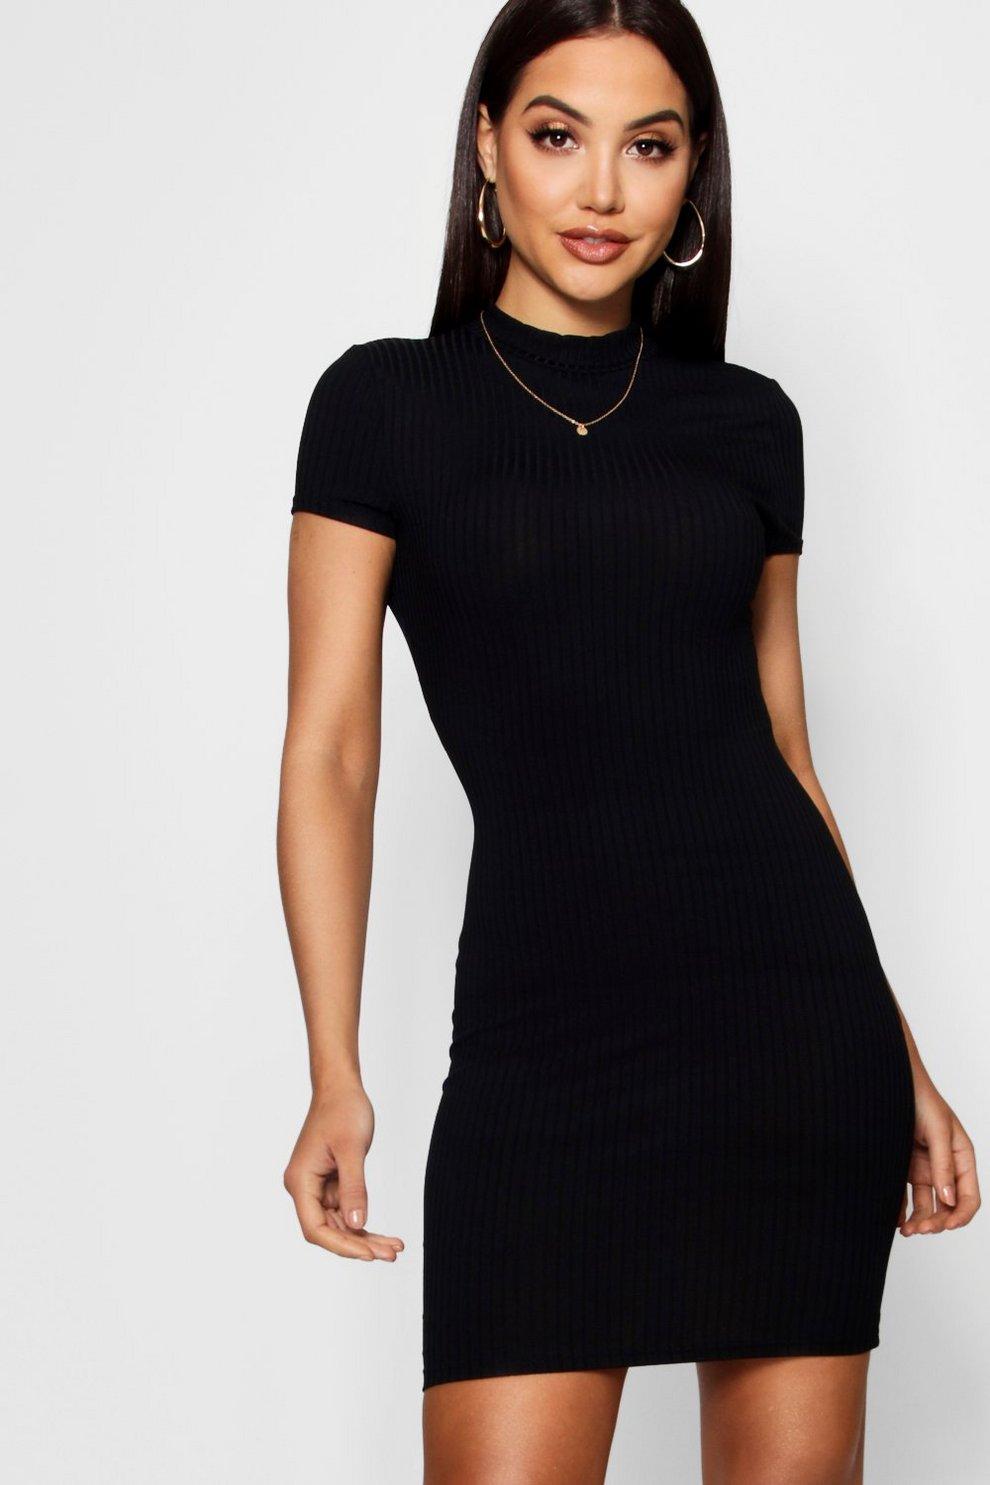 7b015caeb8e2 Womens Black High Neck Cap Sleeve Rib Bodycon Dress